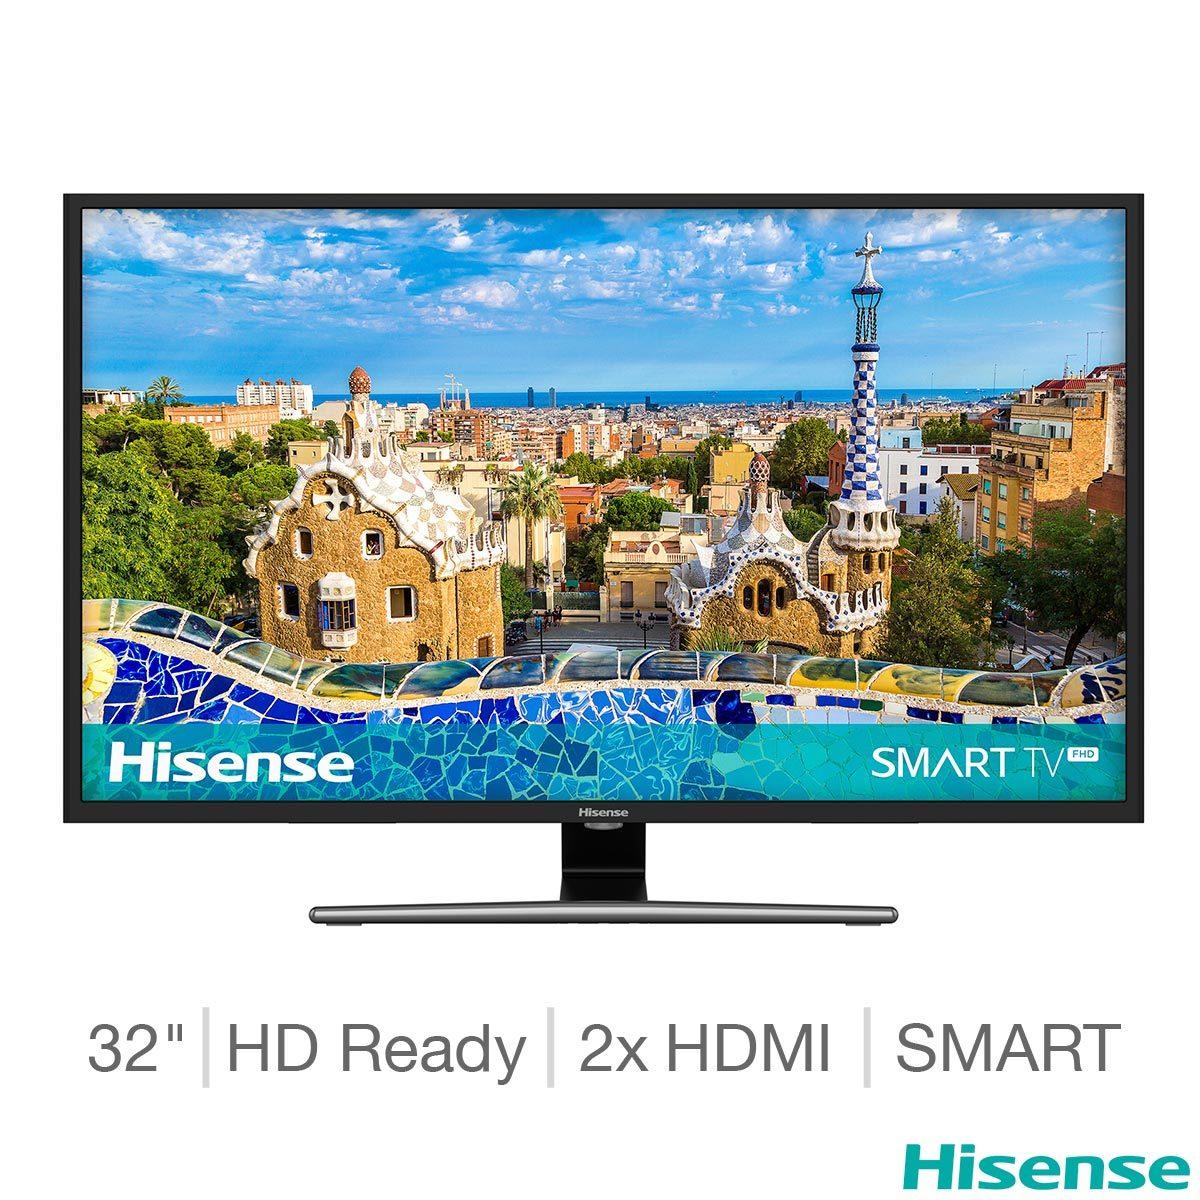 Hisense 32A5800UK 32 Inch HD Ready Smart TV £159.89 @ Costco